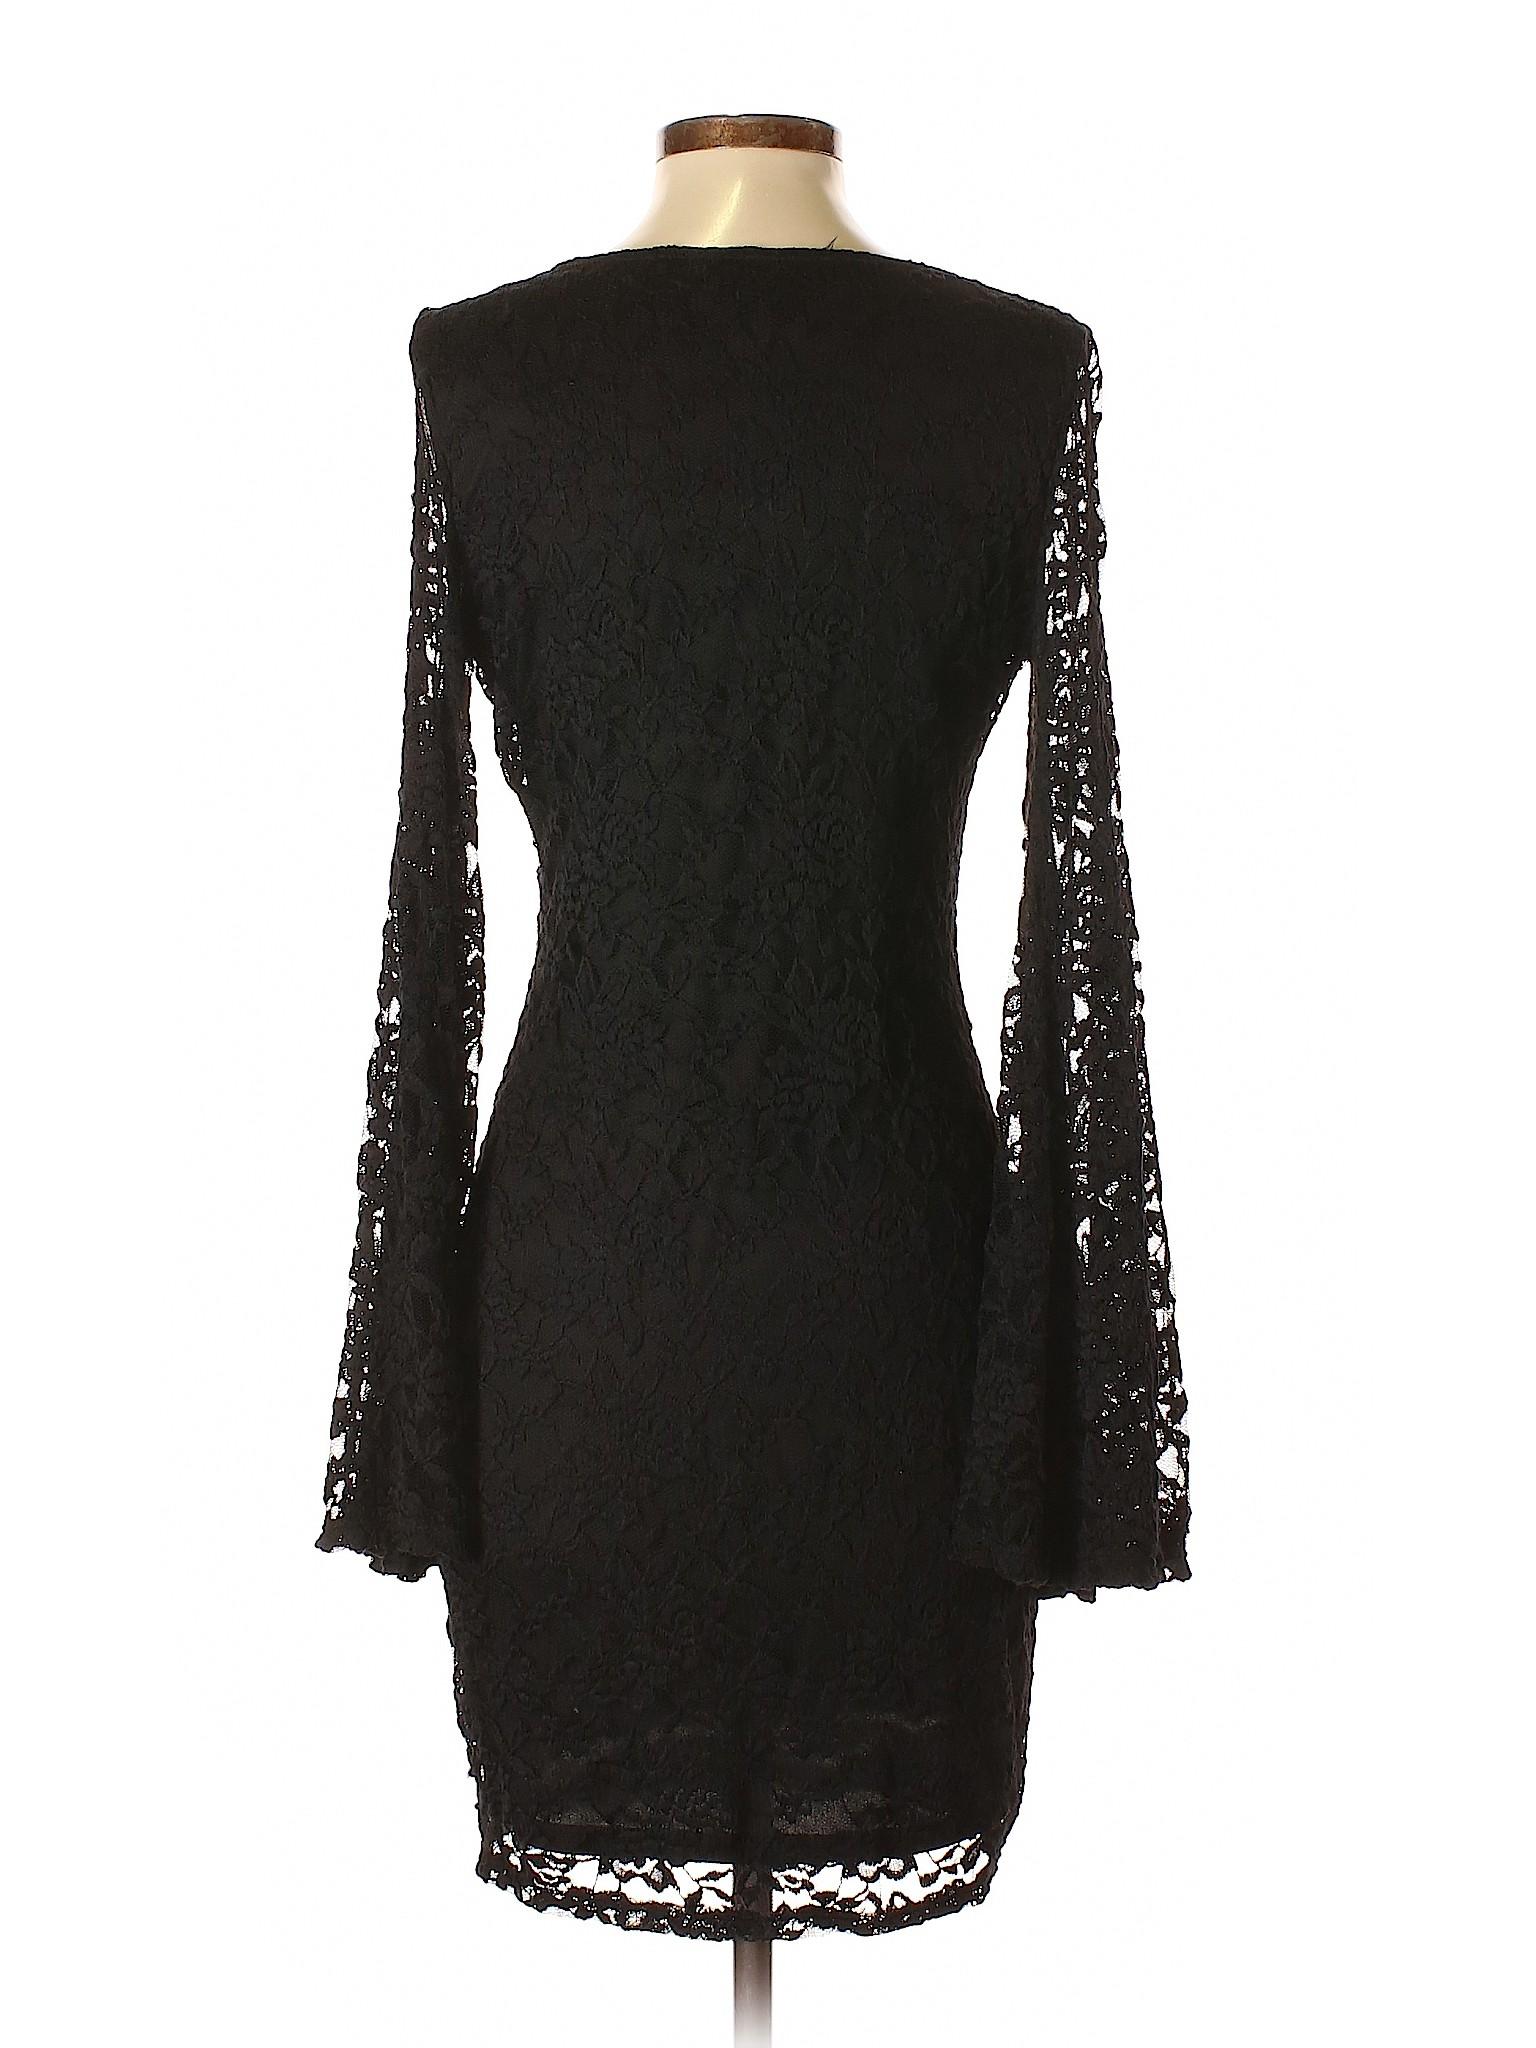 Selling ASOS Dress Dress Selling Dress Casual ASOS ASOS Selling Casual Selling Casual gqOn8Rz